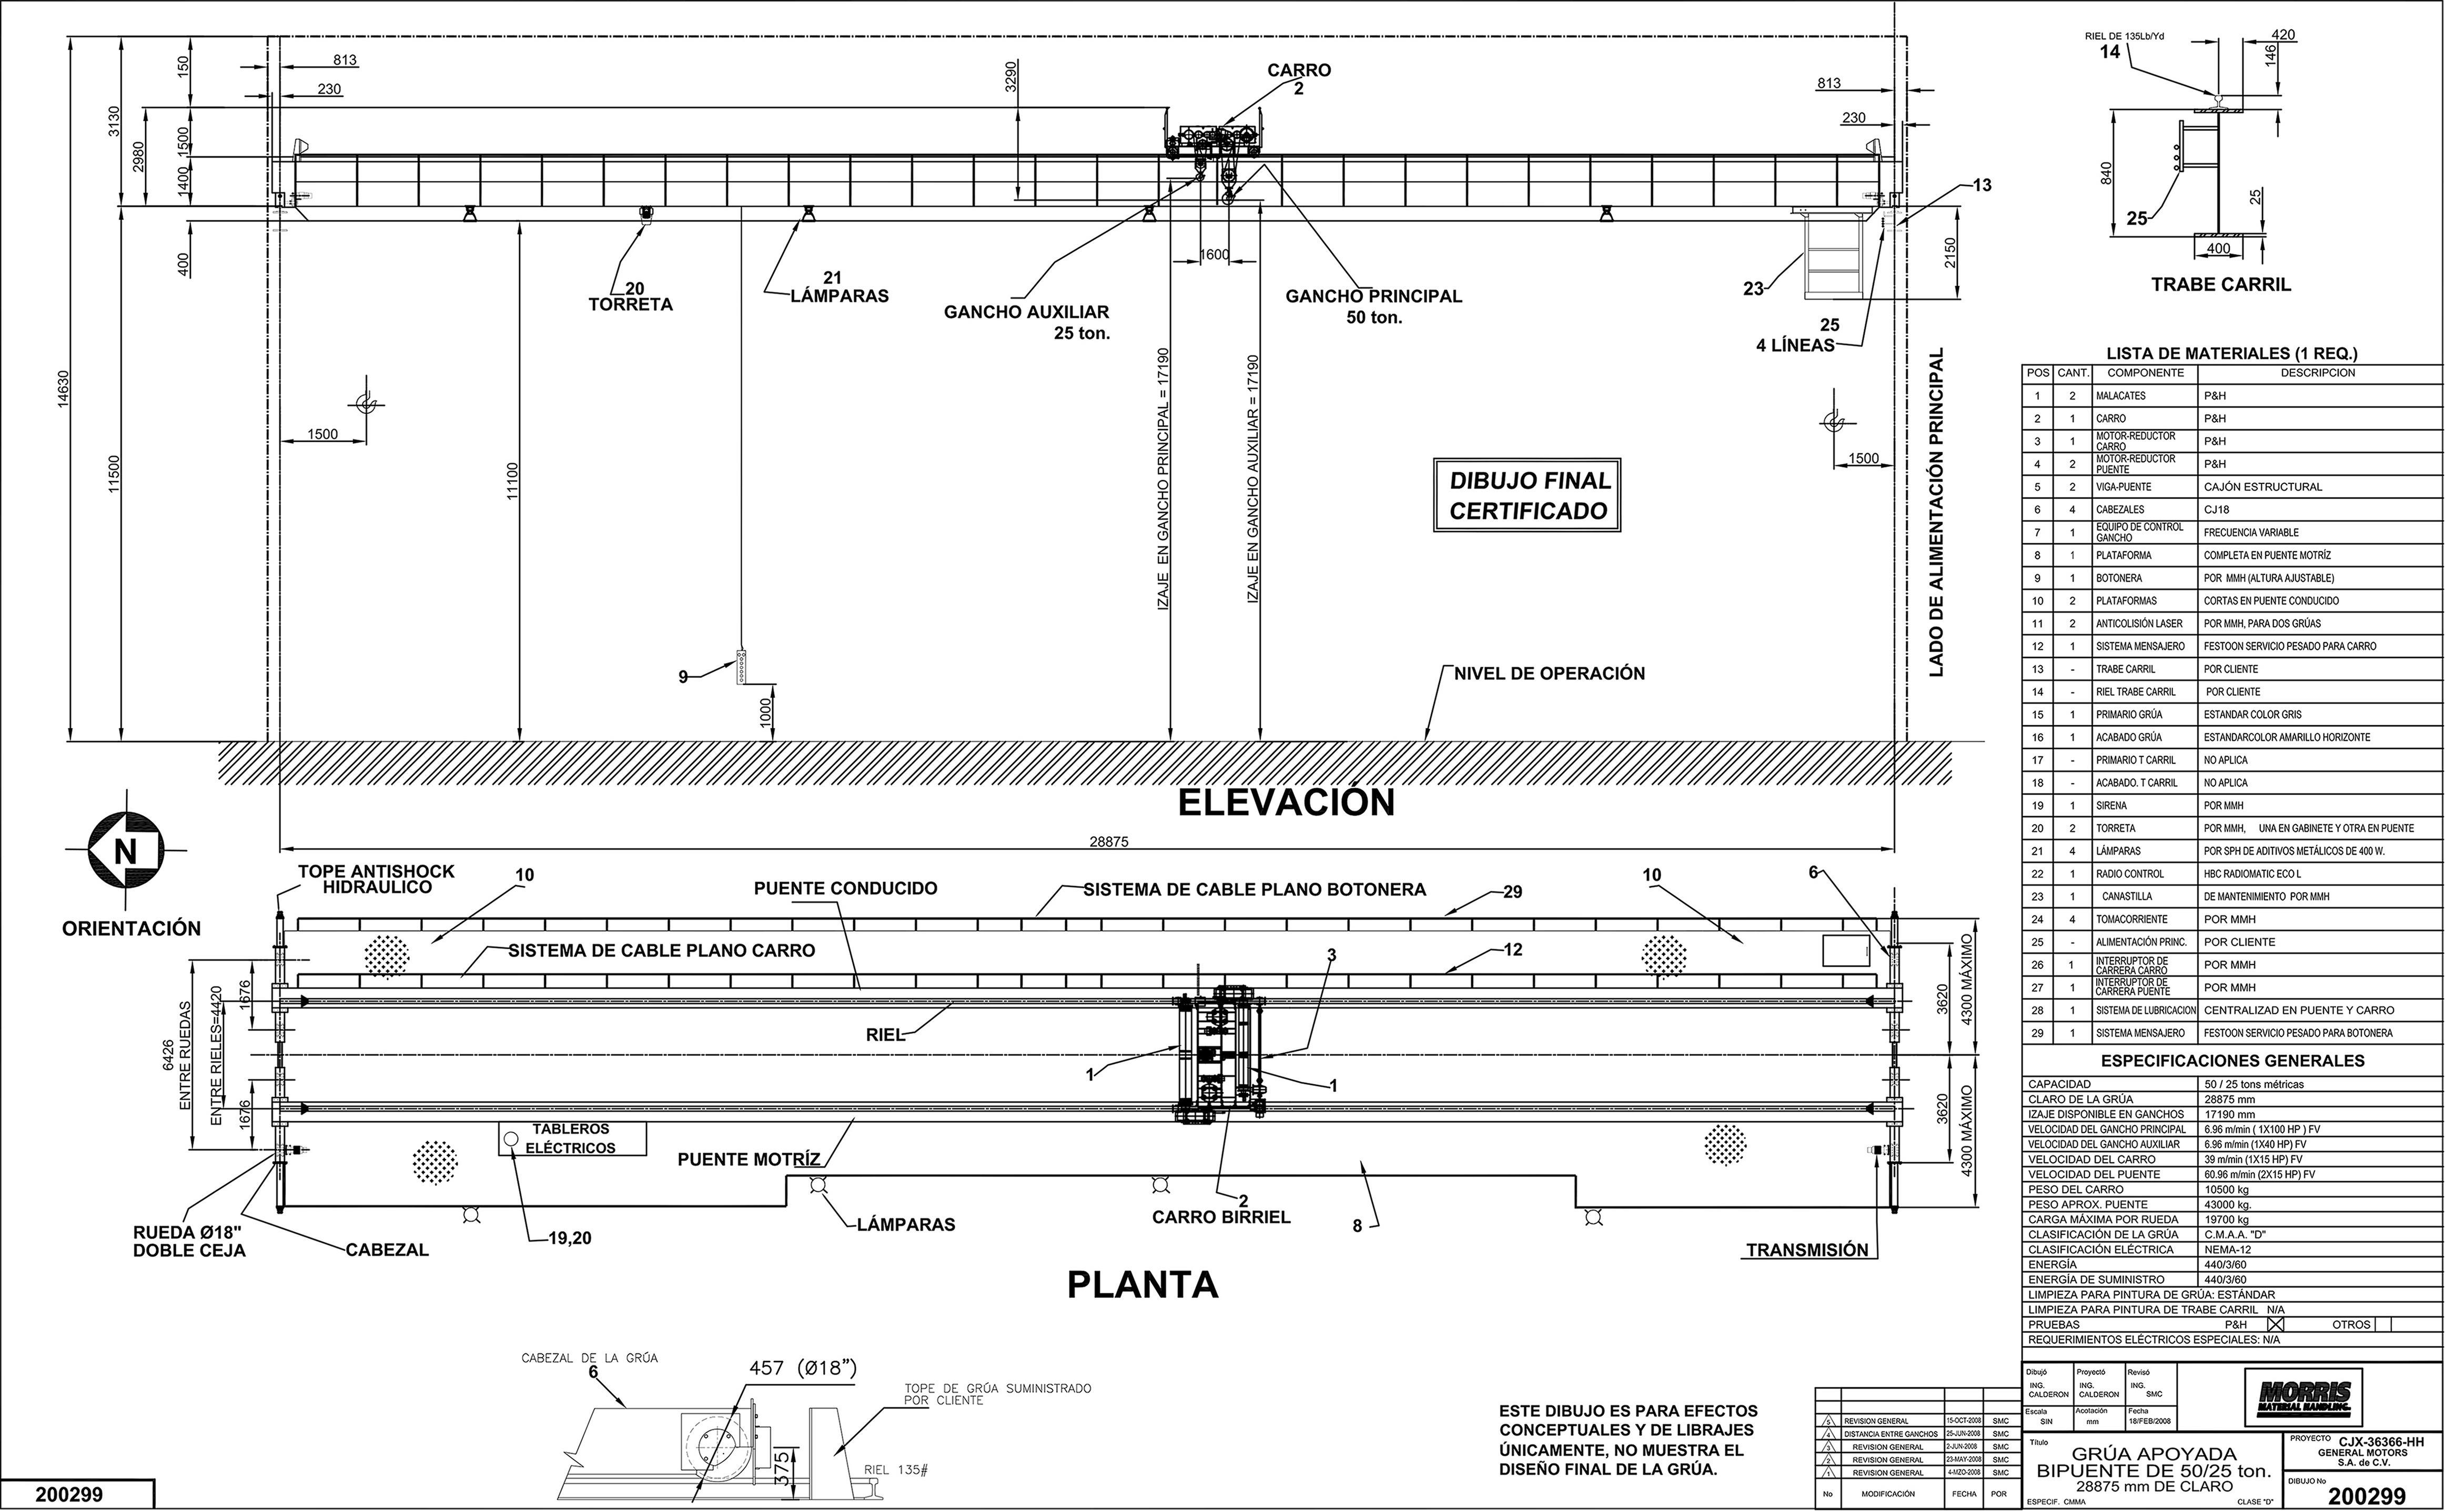 50/25 TON X 94' P&H DUAL GIRDER CLASS D OVERHEAD BRIDGE CRANE: STOCK #10030